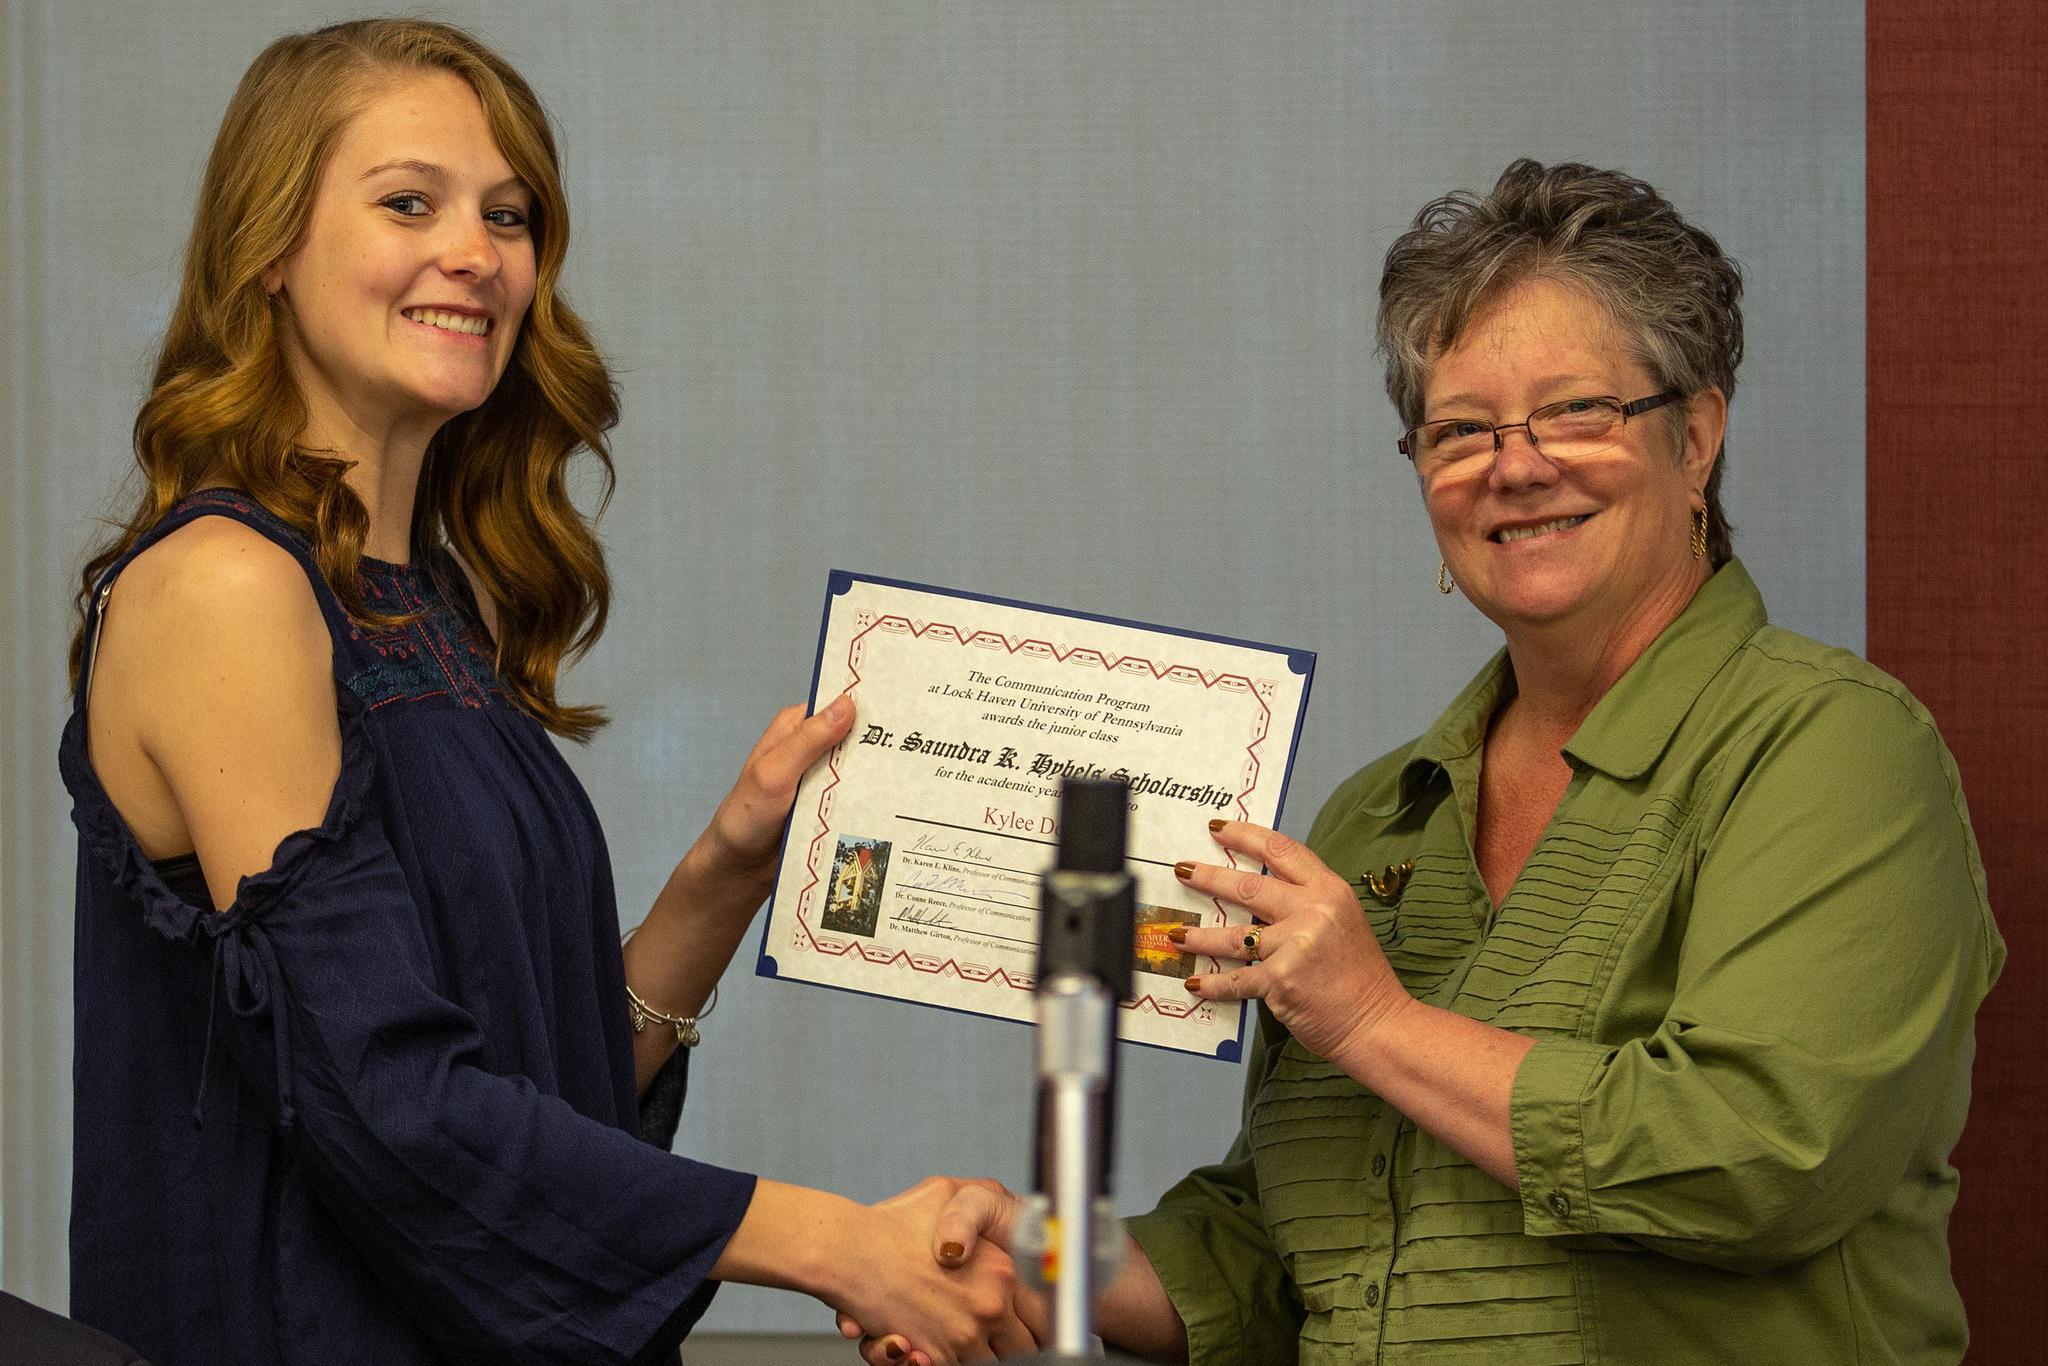 Kylee Doyle – Kylee Doyle, Dr. Saundra K. Hybels Scholarship junior award recipient, left, presented by Dr. Conne Reece, LHU professor.